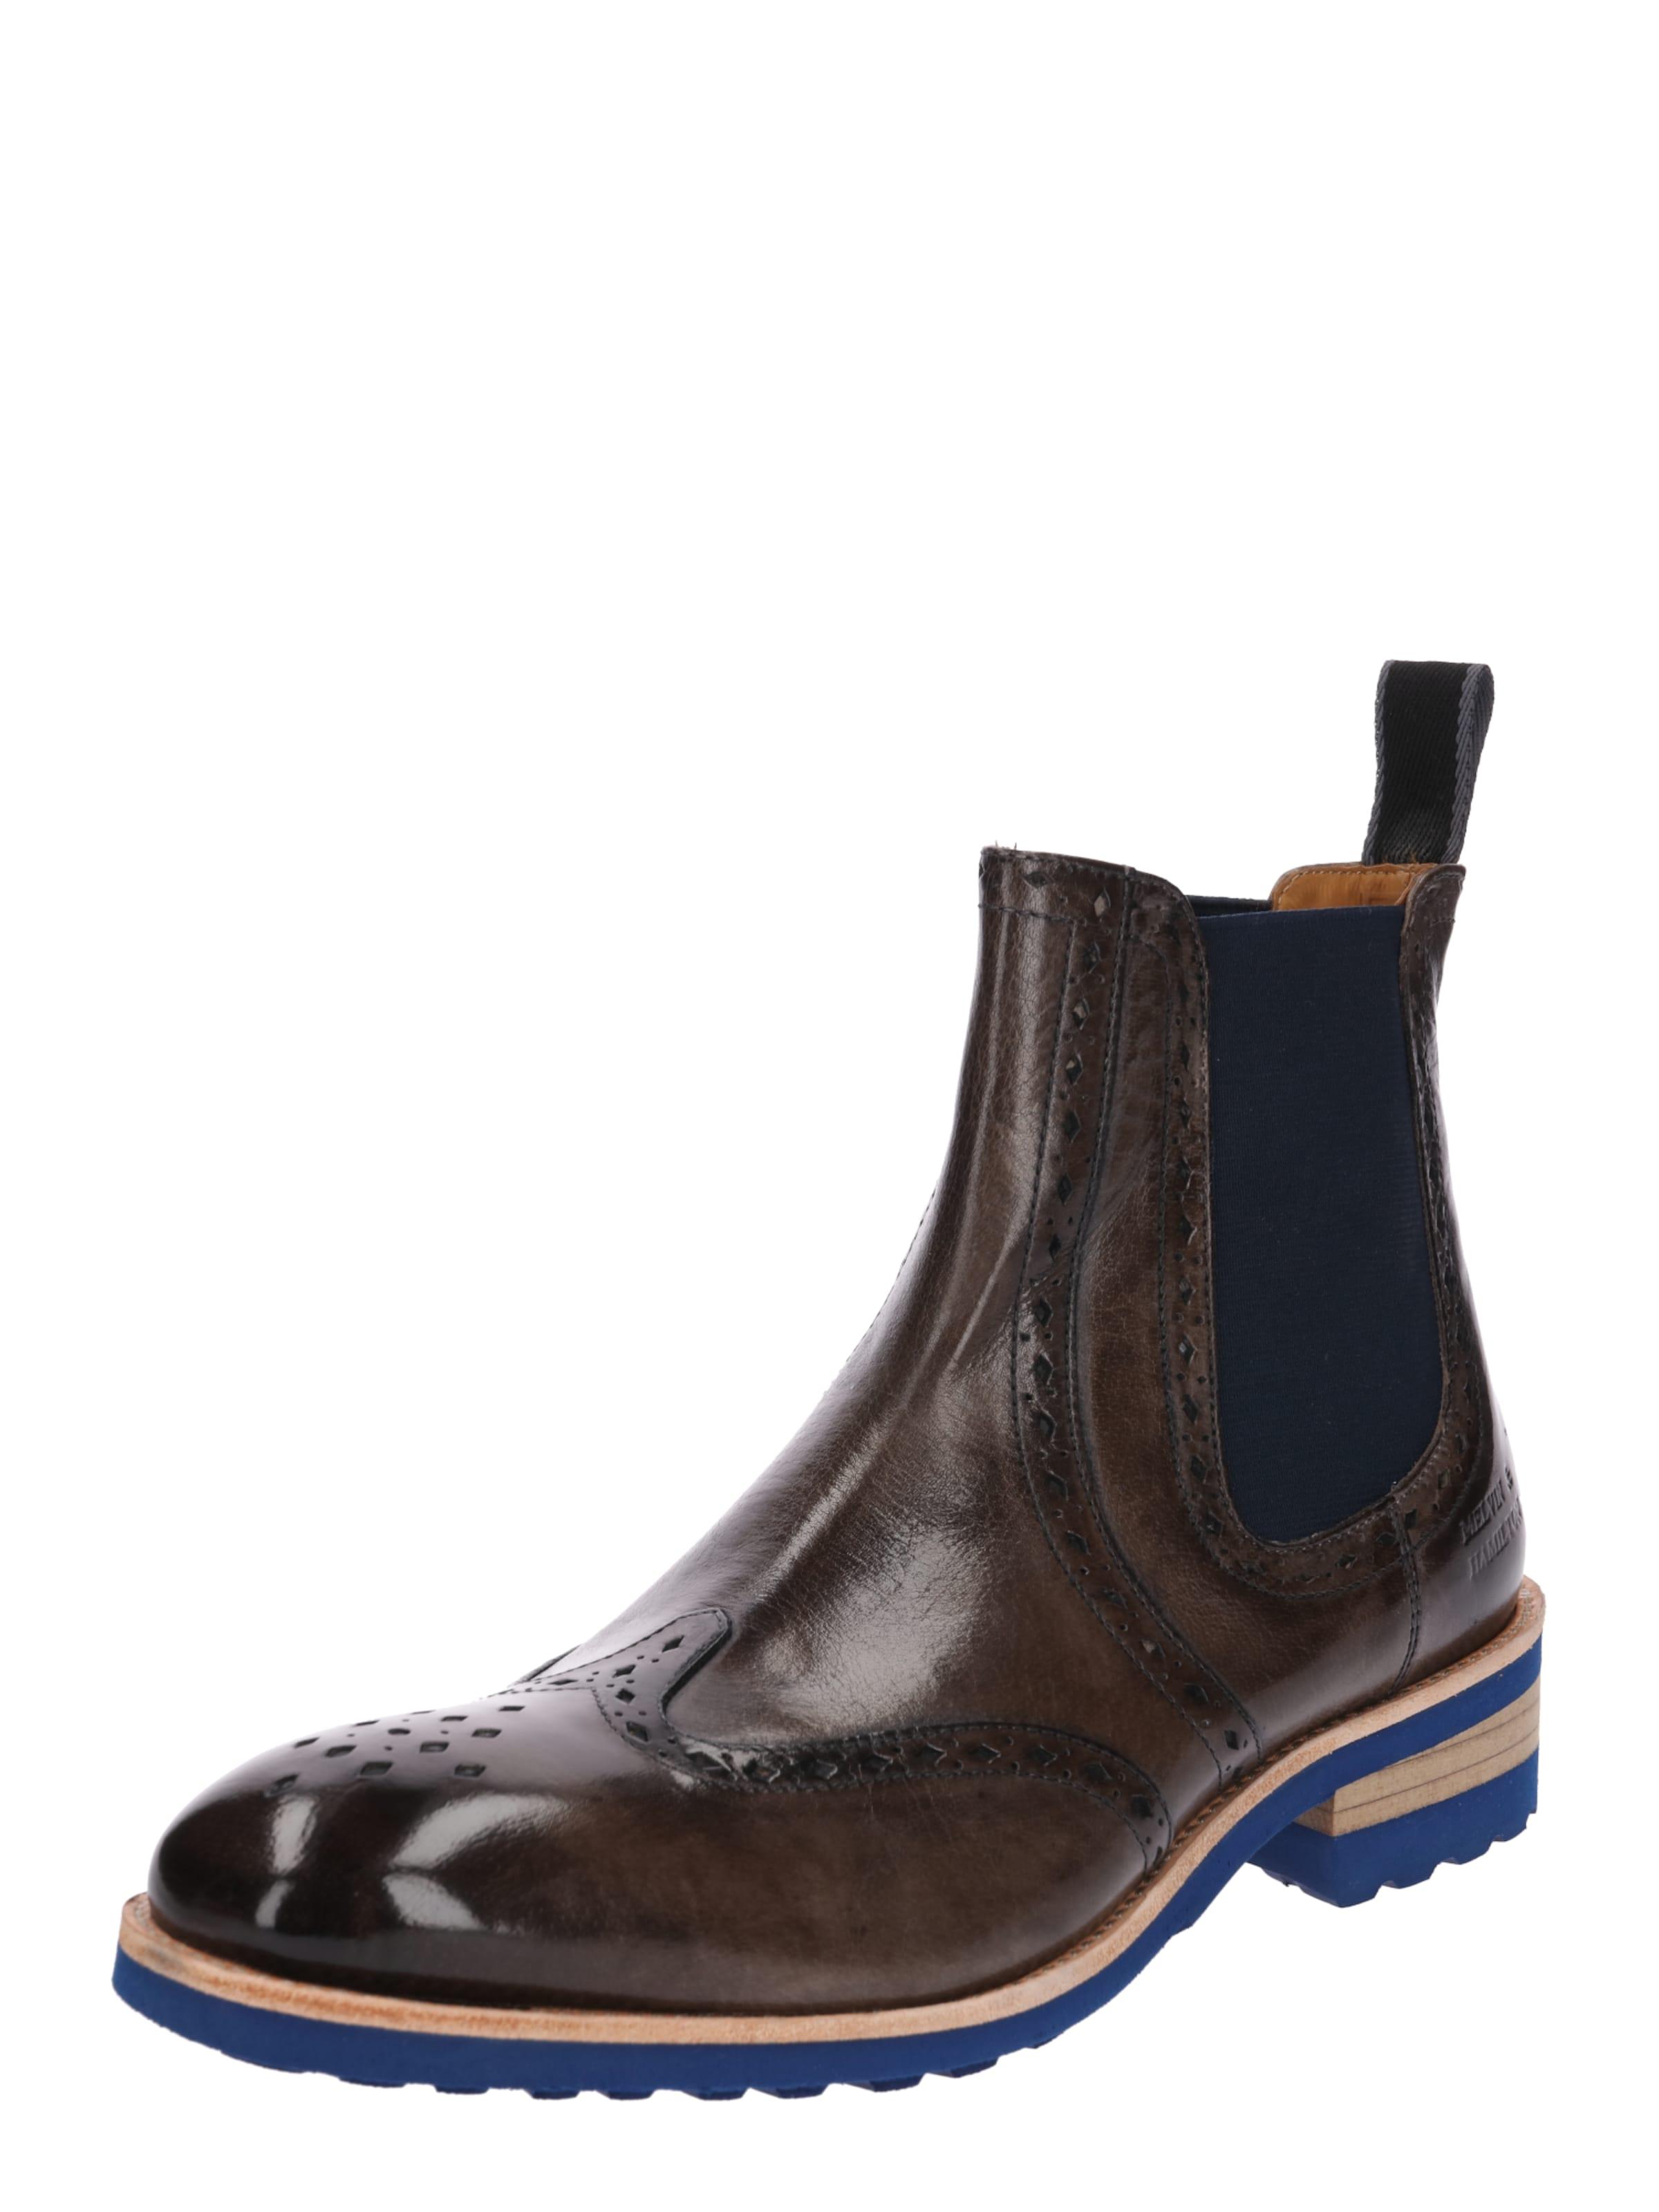 Melvinamp; boots 'walter In Dunkelbraun Hamilton Chelsea 9' CxEQrBodeW